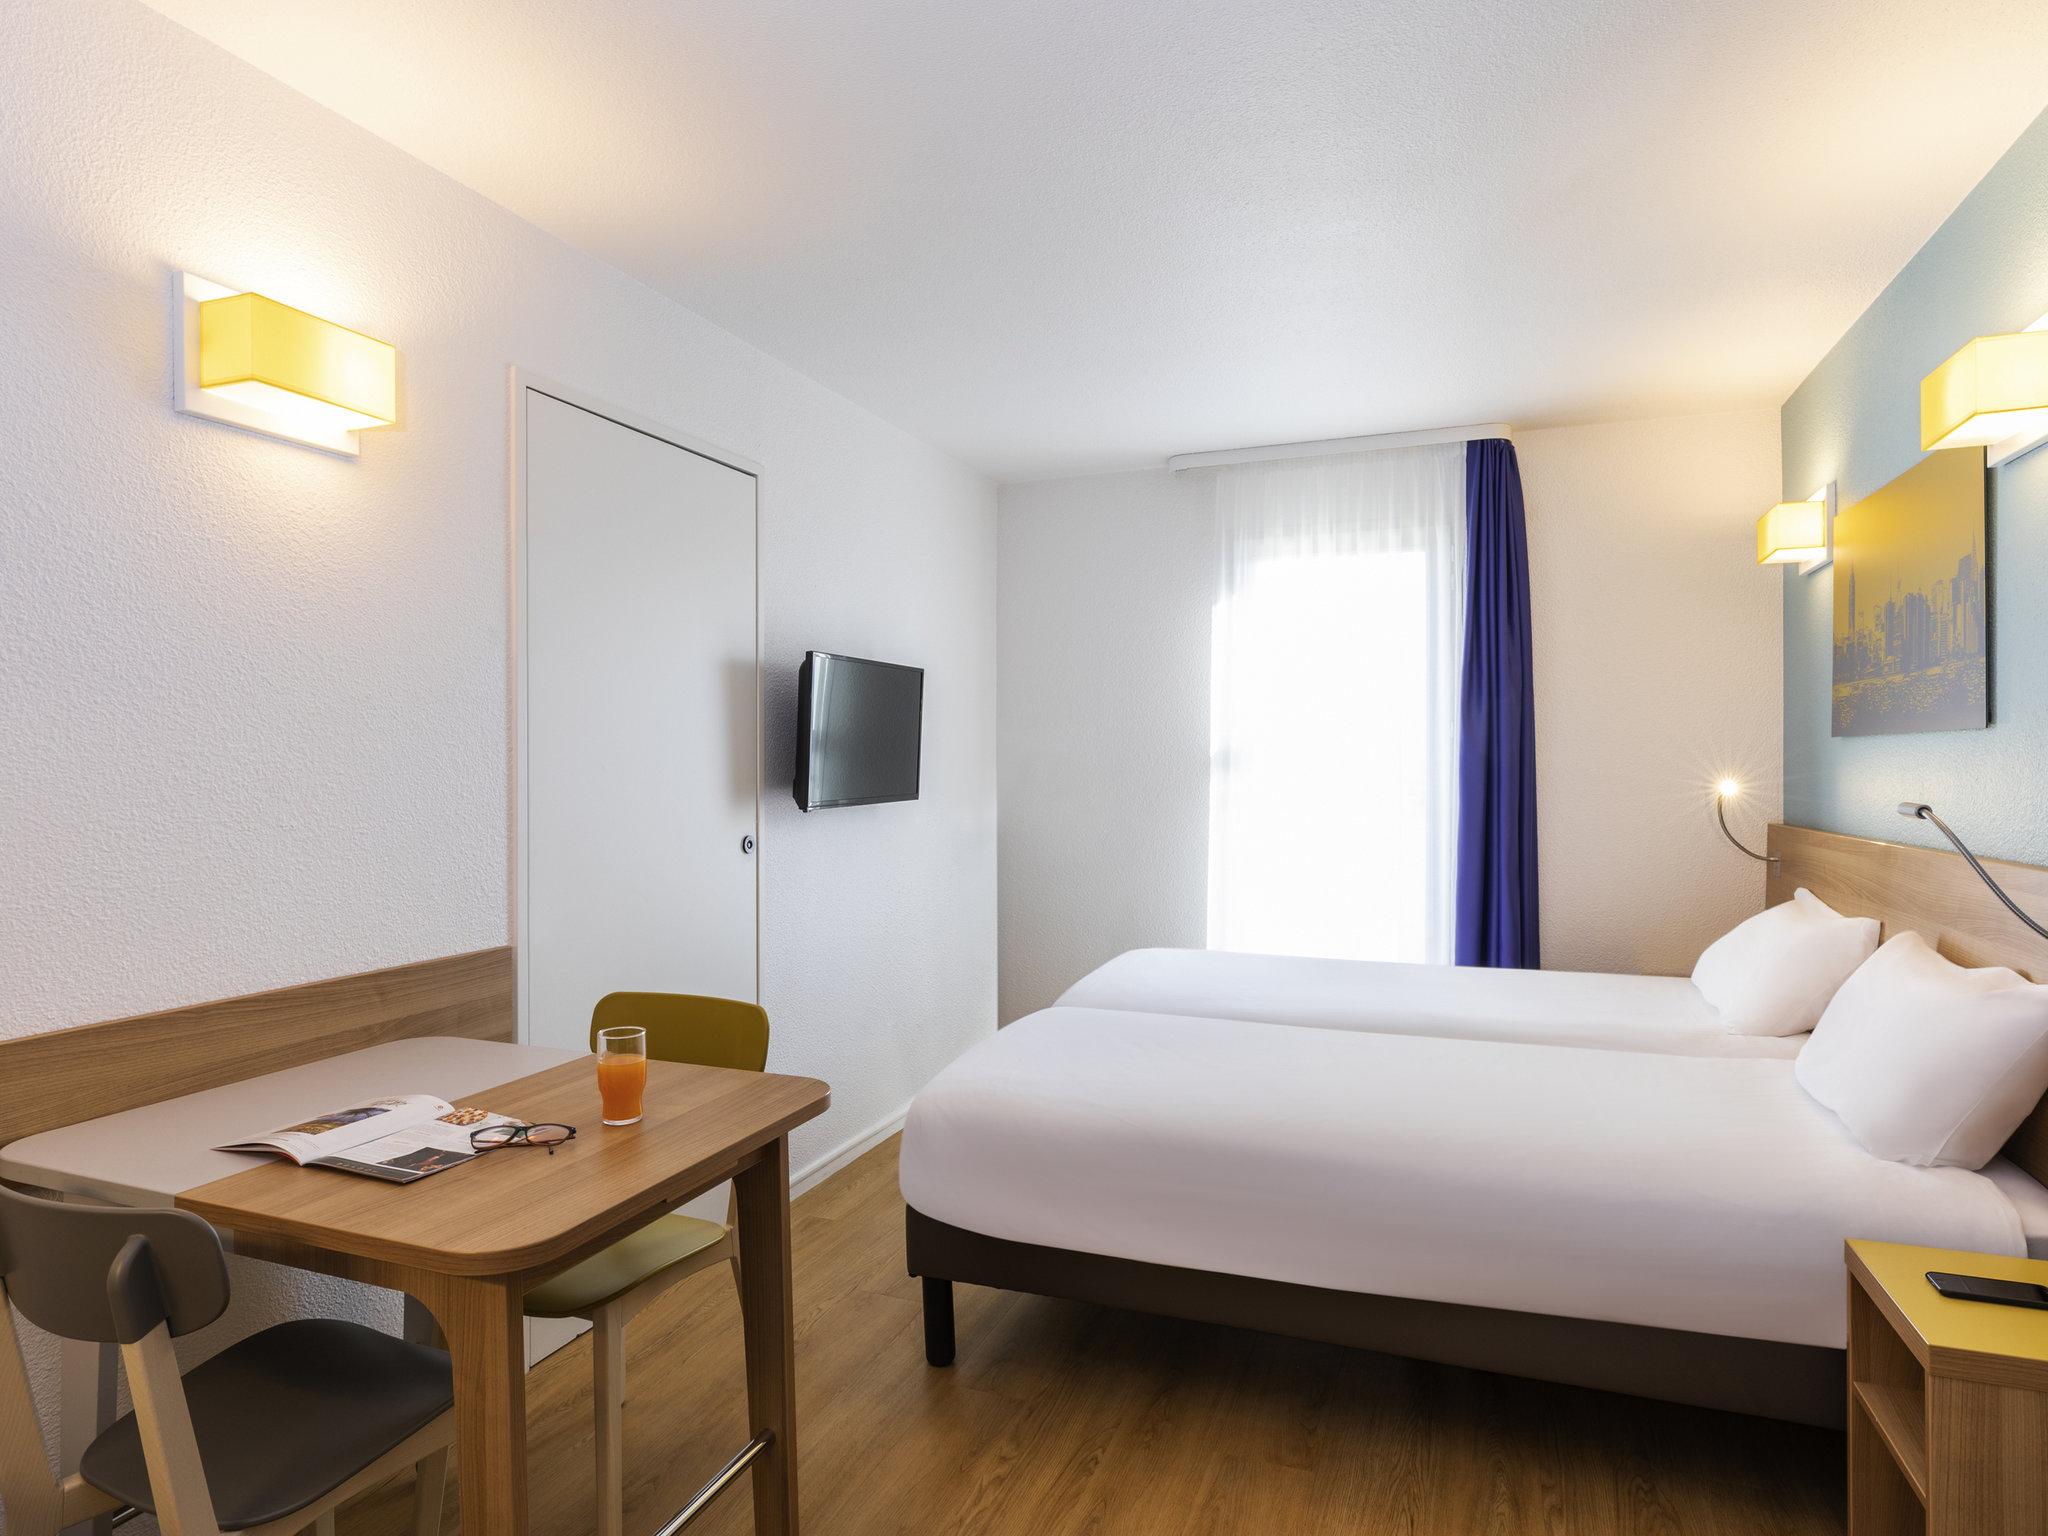 H tel courbevoie aparthotel adagio access la d fense for Apart hotel maison alfort